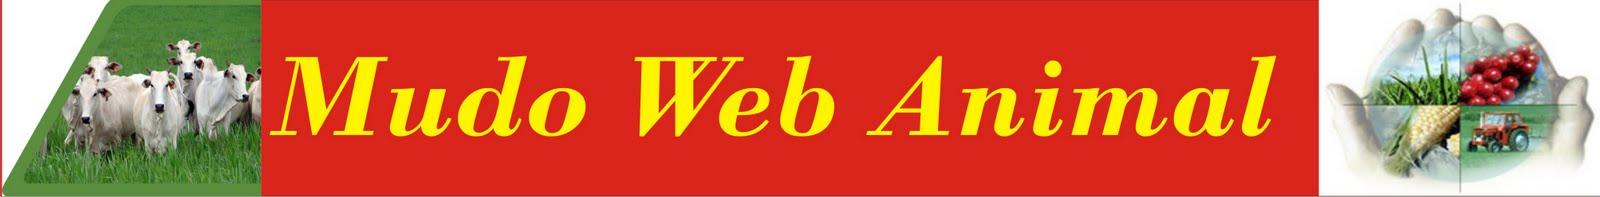 MUNDO WEB ANIMAL